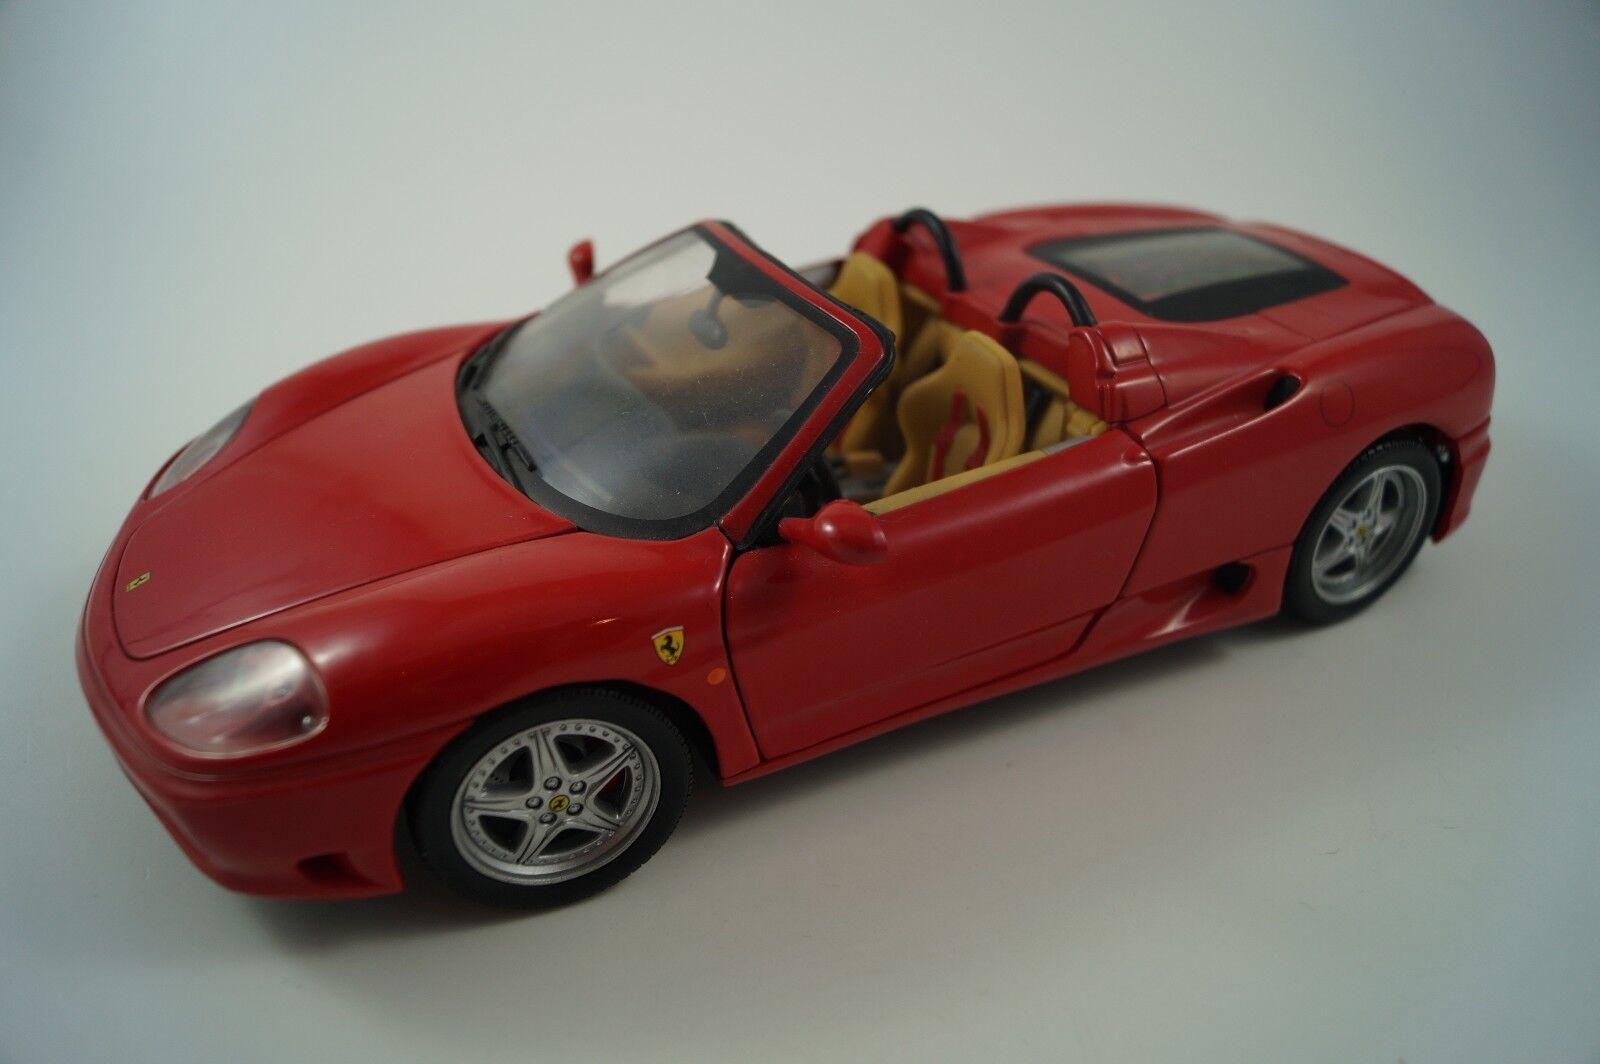 Hot Wheels Modellauto 1 18 Ferrari 360 Spider  |  Neuer Markt